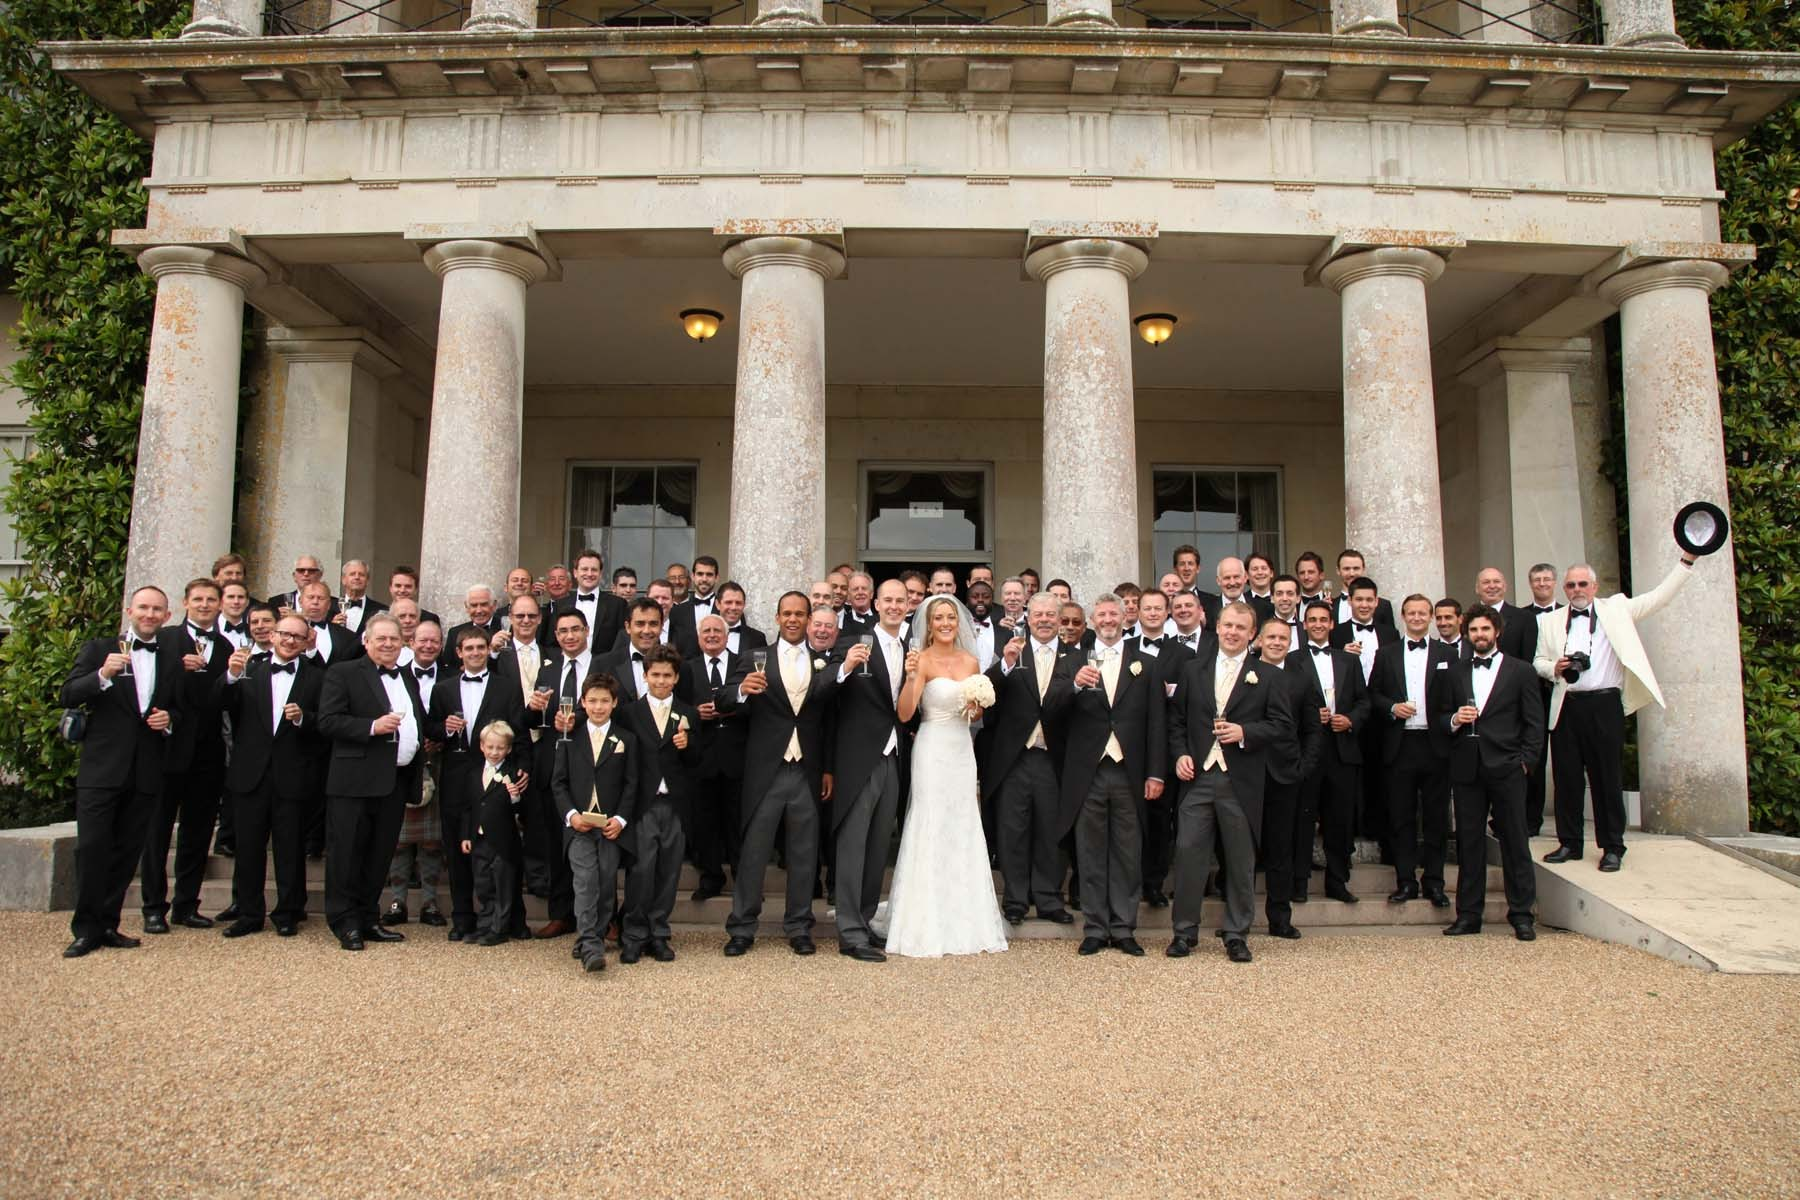 Sussex & Surrey Wedding Photographer - Guests & Groups (34)